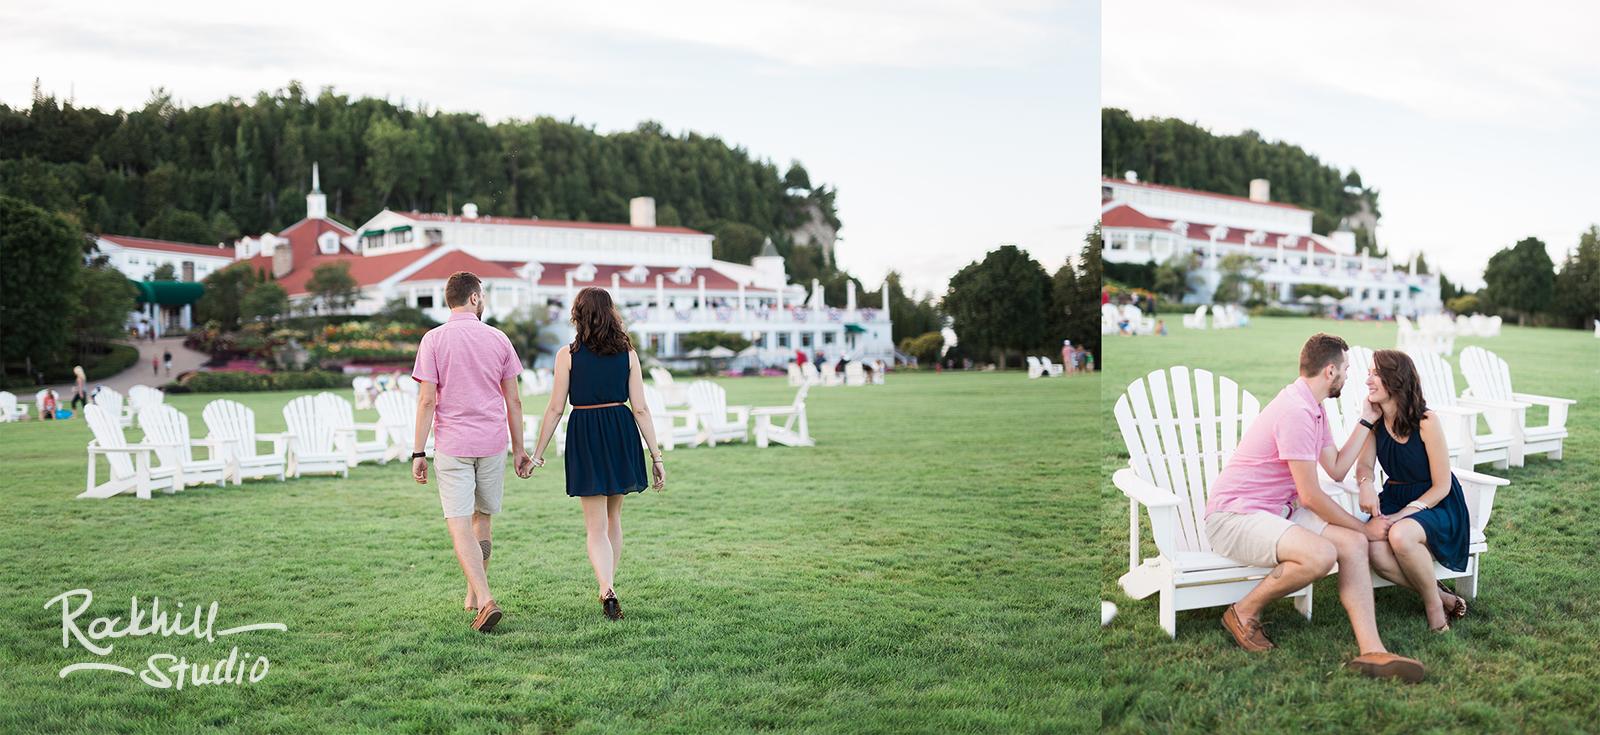 mackinac-island-wedding-engagement-northern-michigan-rockhill-studio-jt-33.jpg